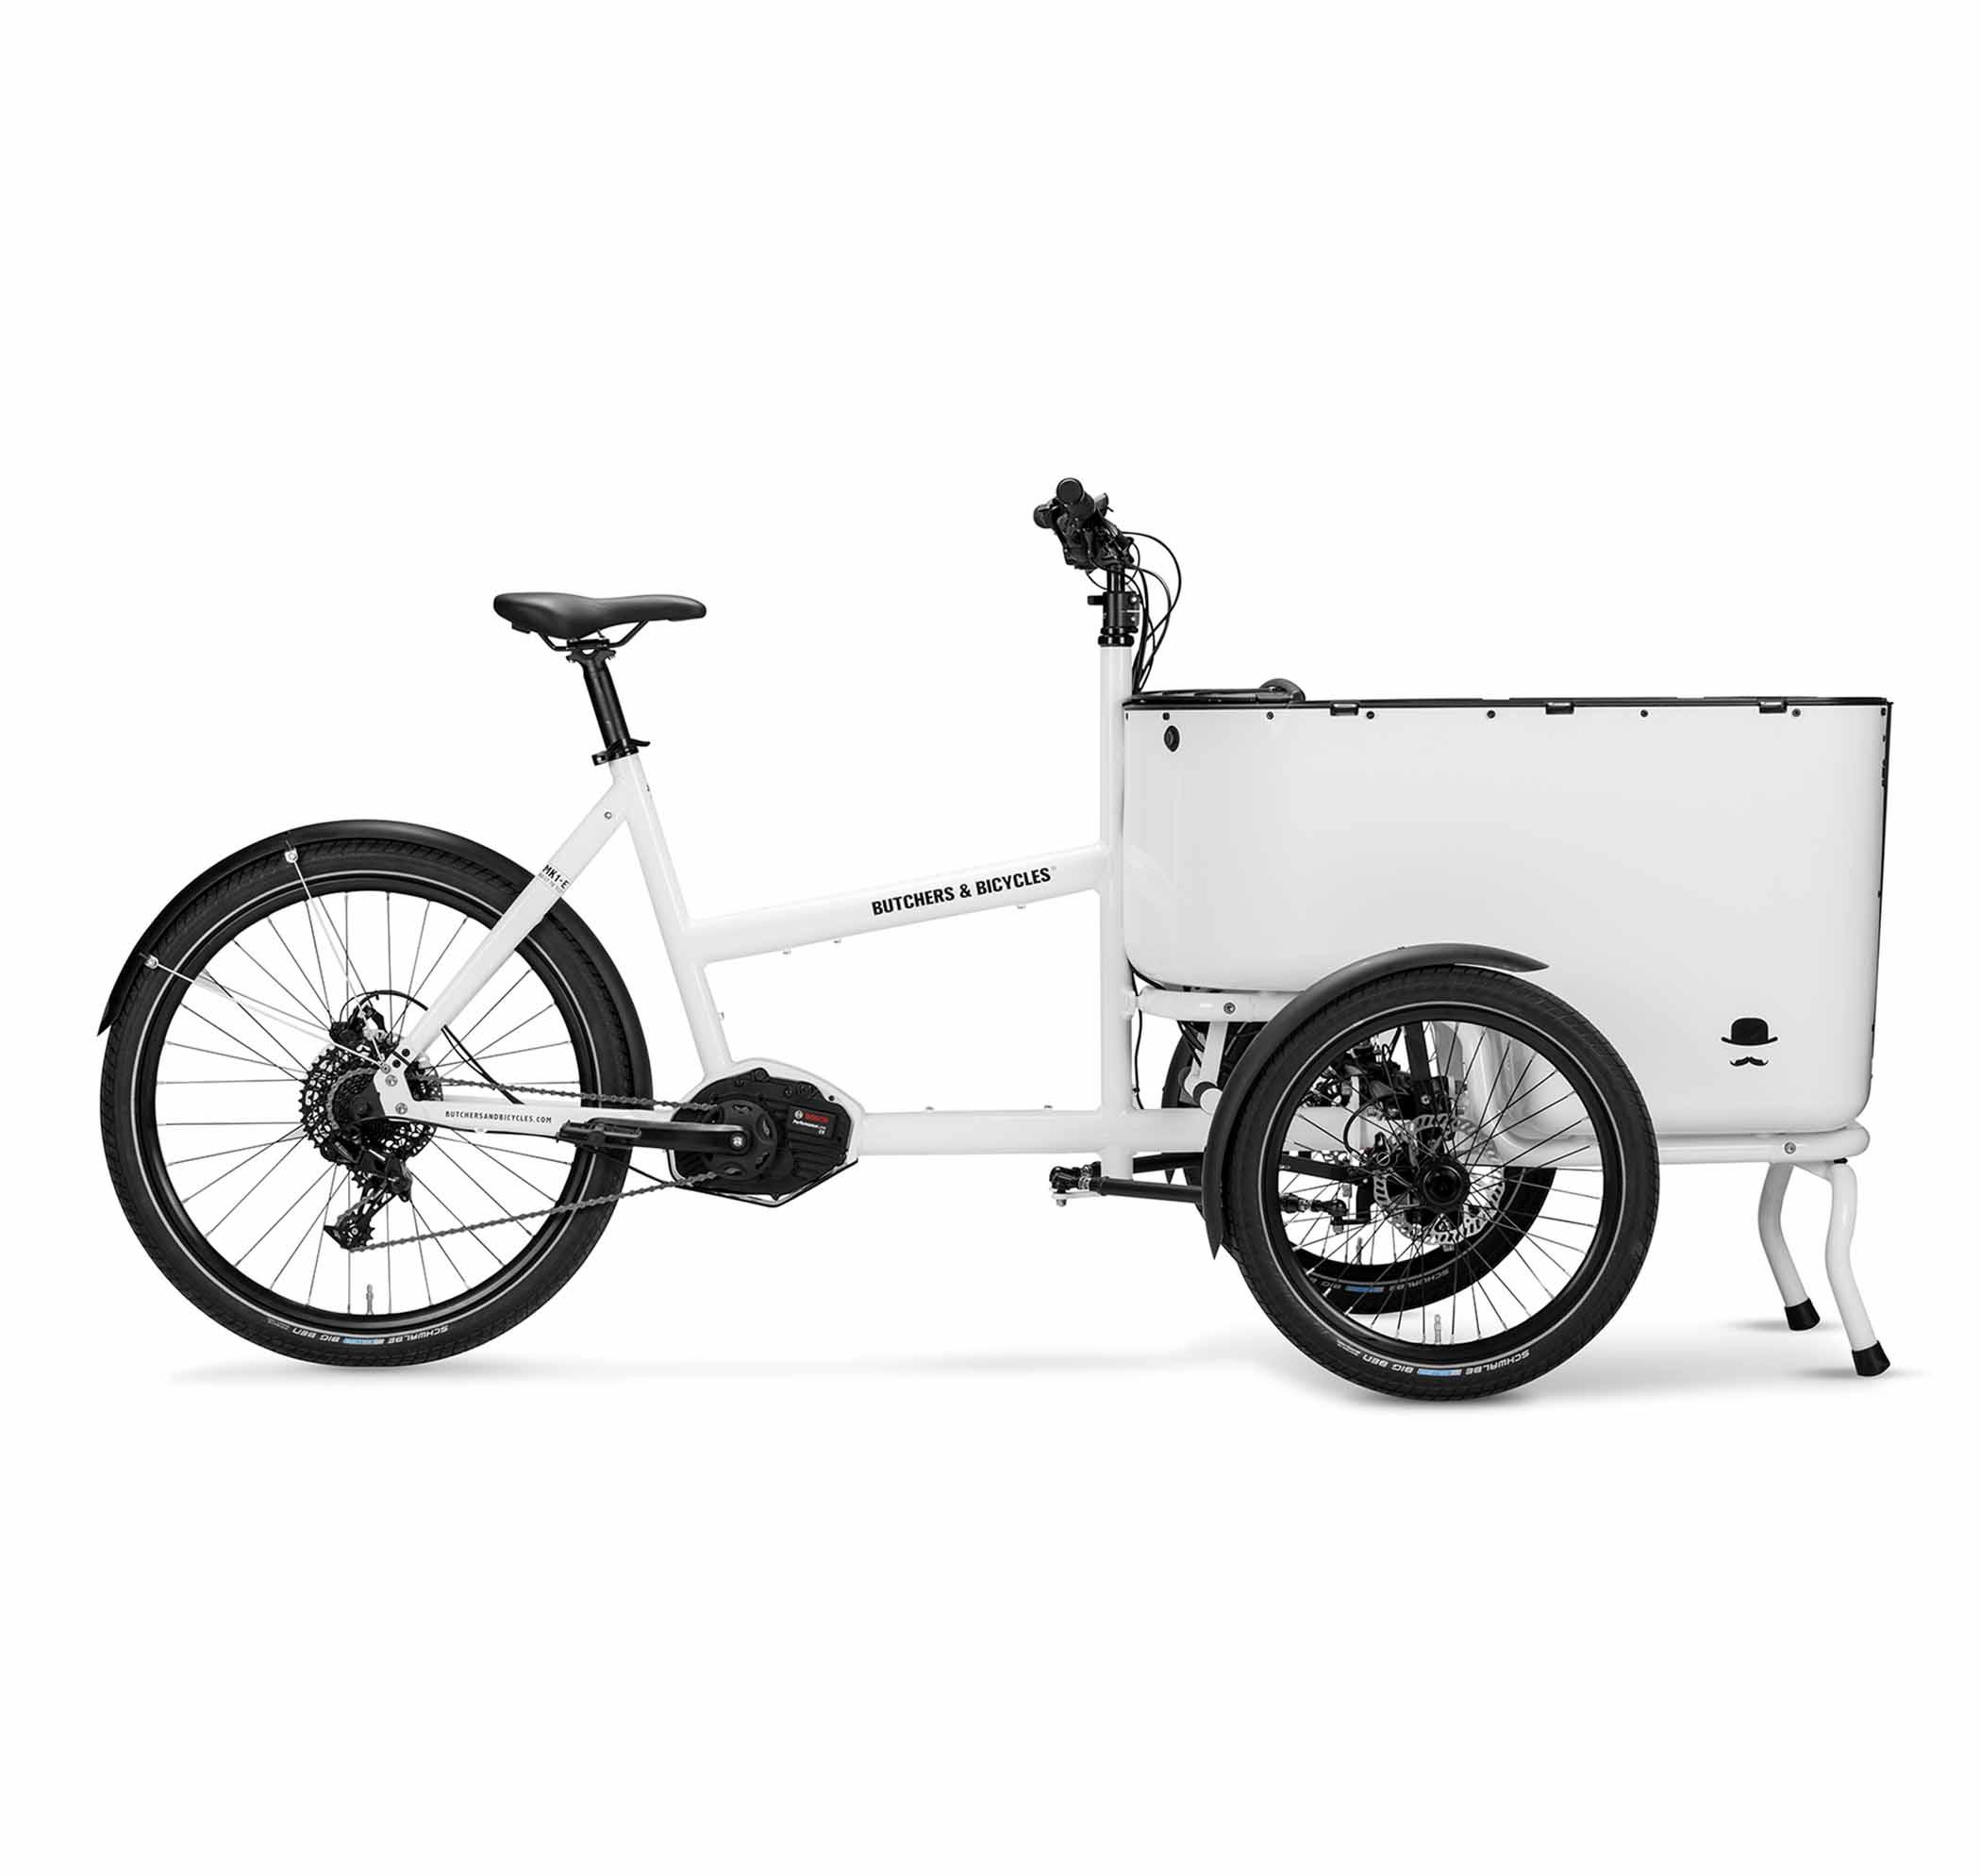 Butchers_Bicycles_Rodeo_Bike_Mk1_E_Touring_White